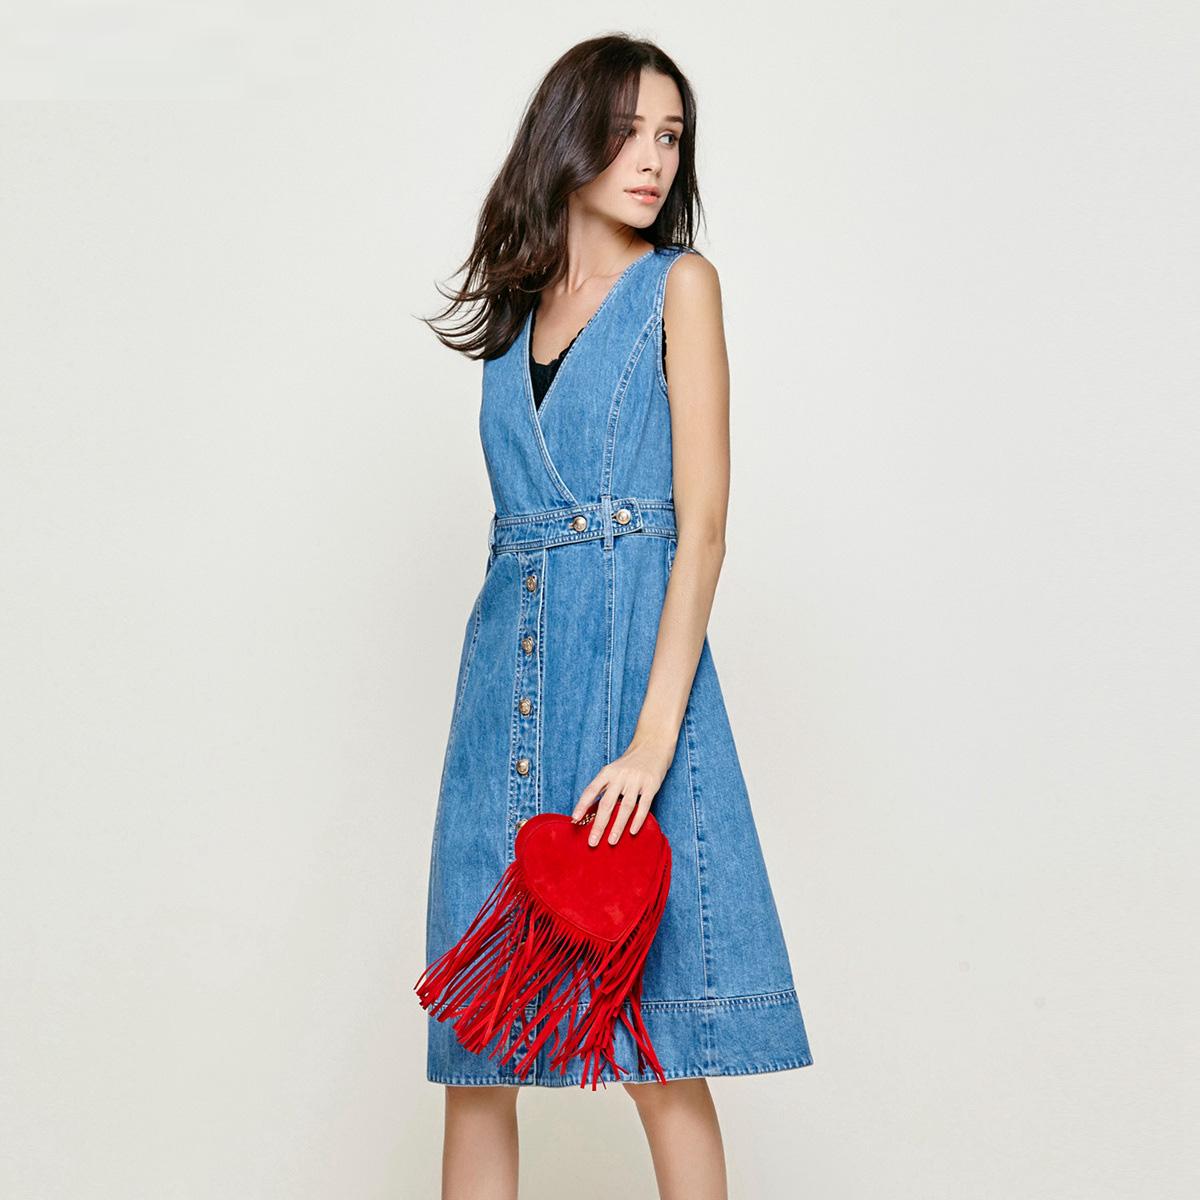 Five Plus新女夏装纯棉单排扣V领无袖牛仔连衣裙背心裙2JM2082240